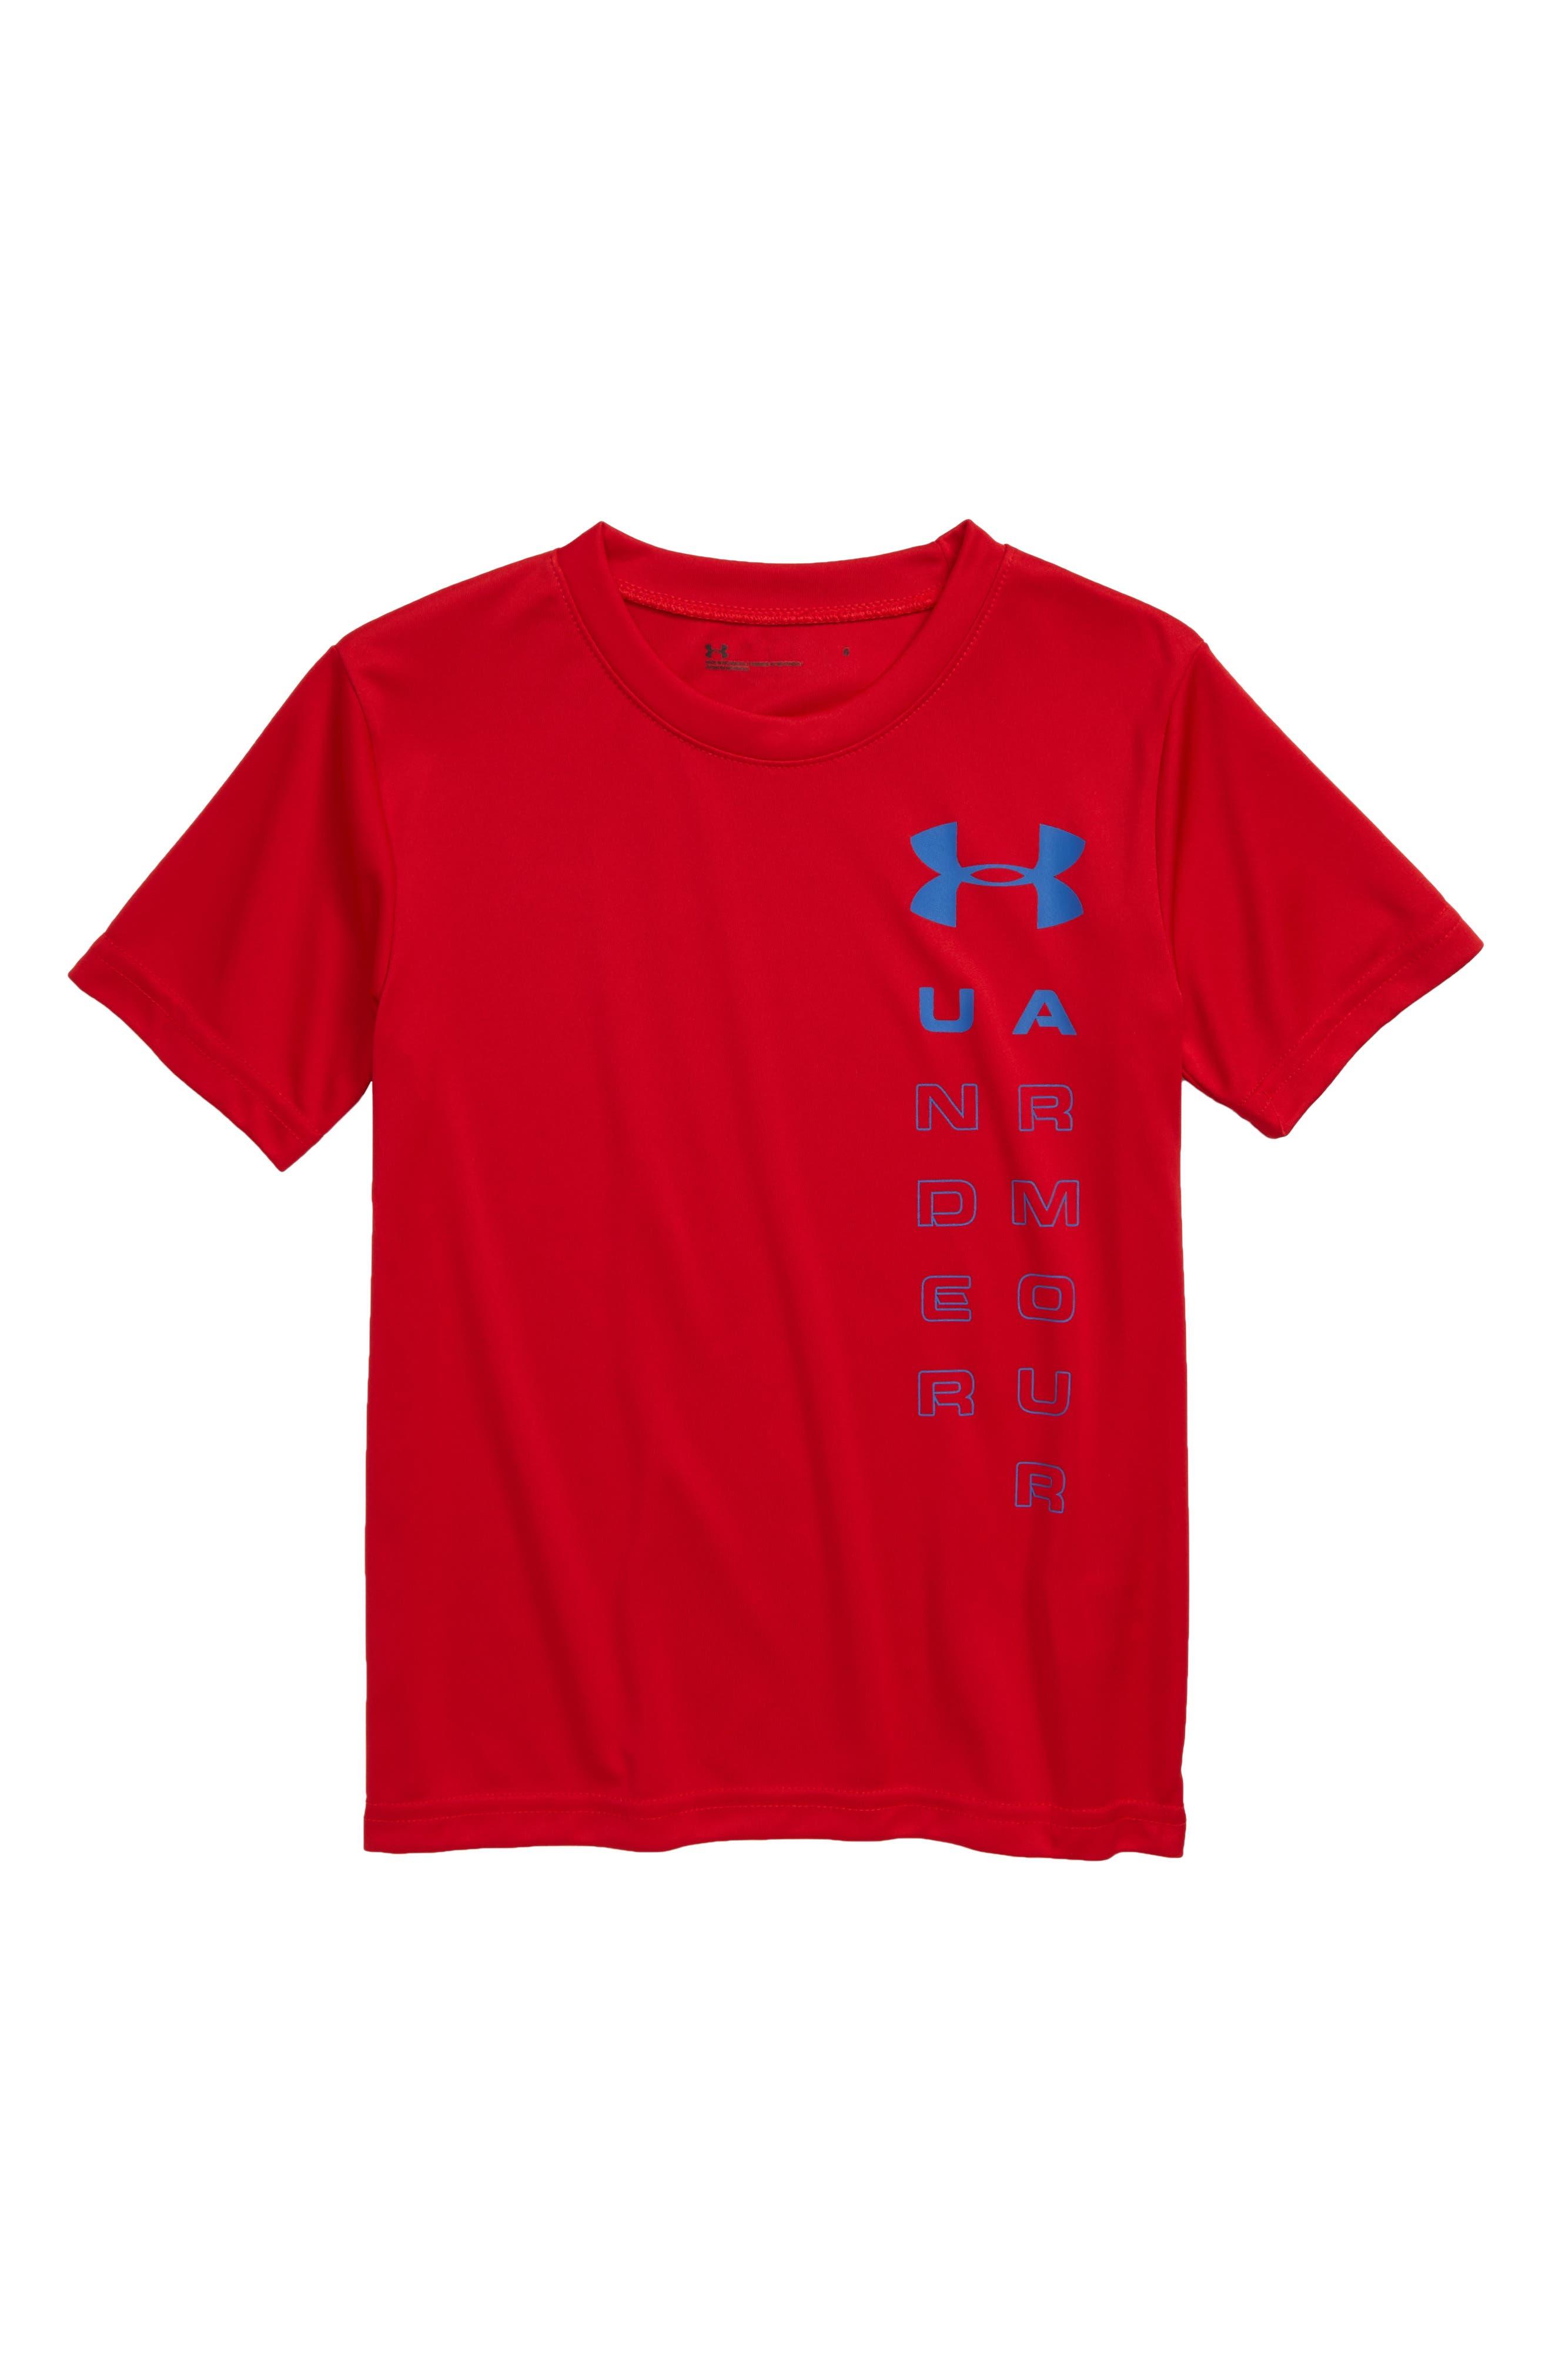 Toddler Boys Under Armour Logo Heatgear TShirt Size 2T  Red